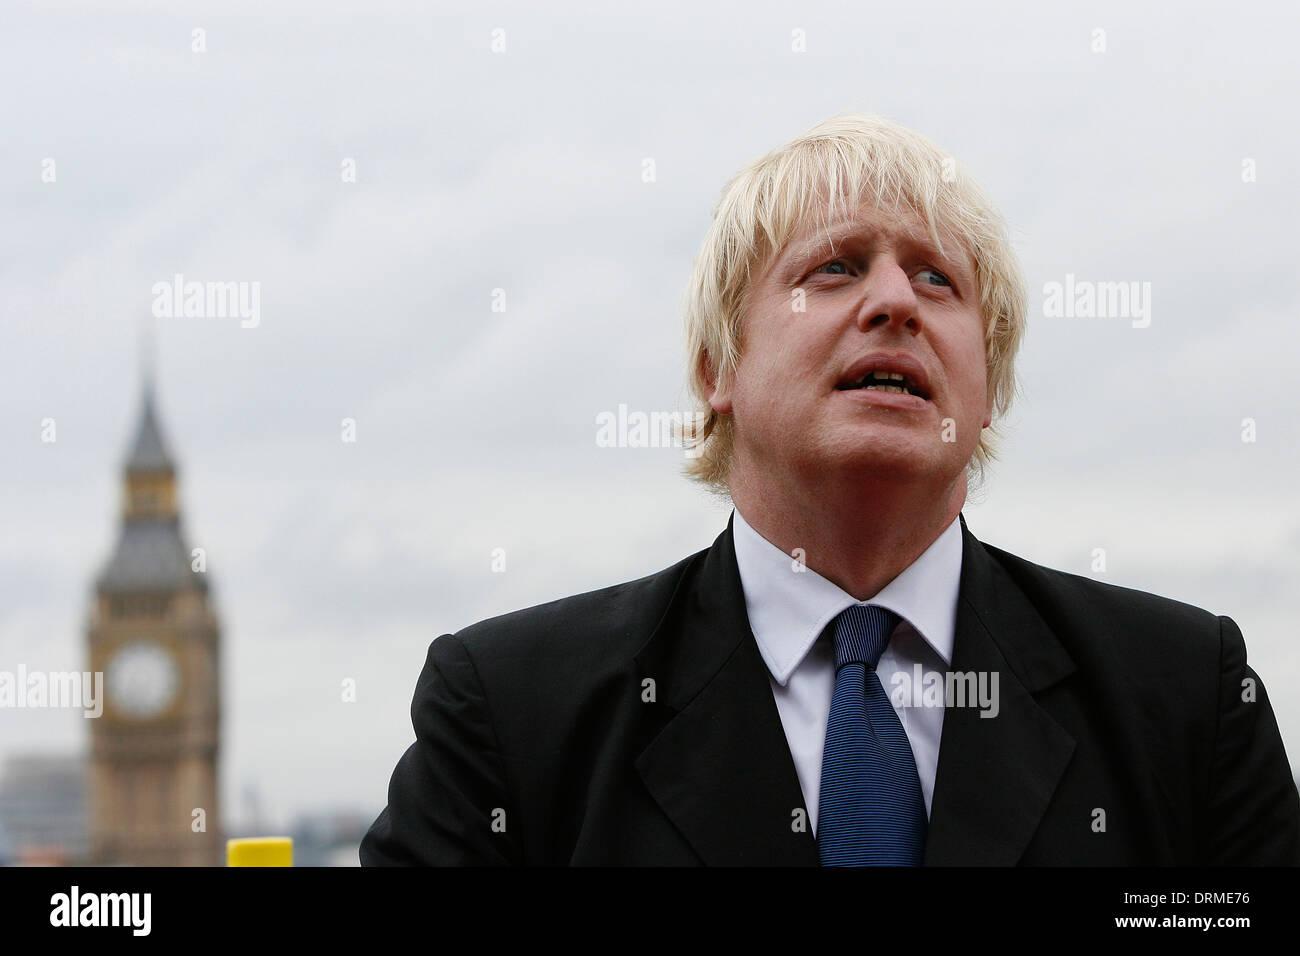 Mayor of London Boris Johnson in front of Big Ben London - Stock Image